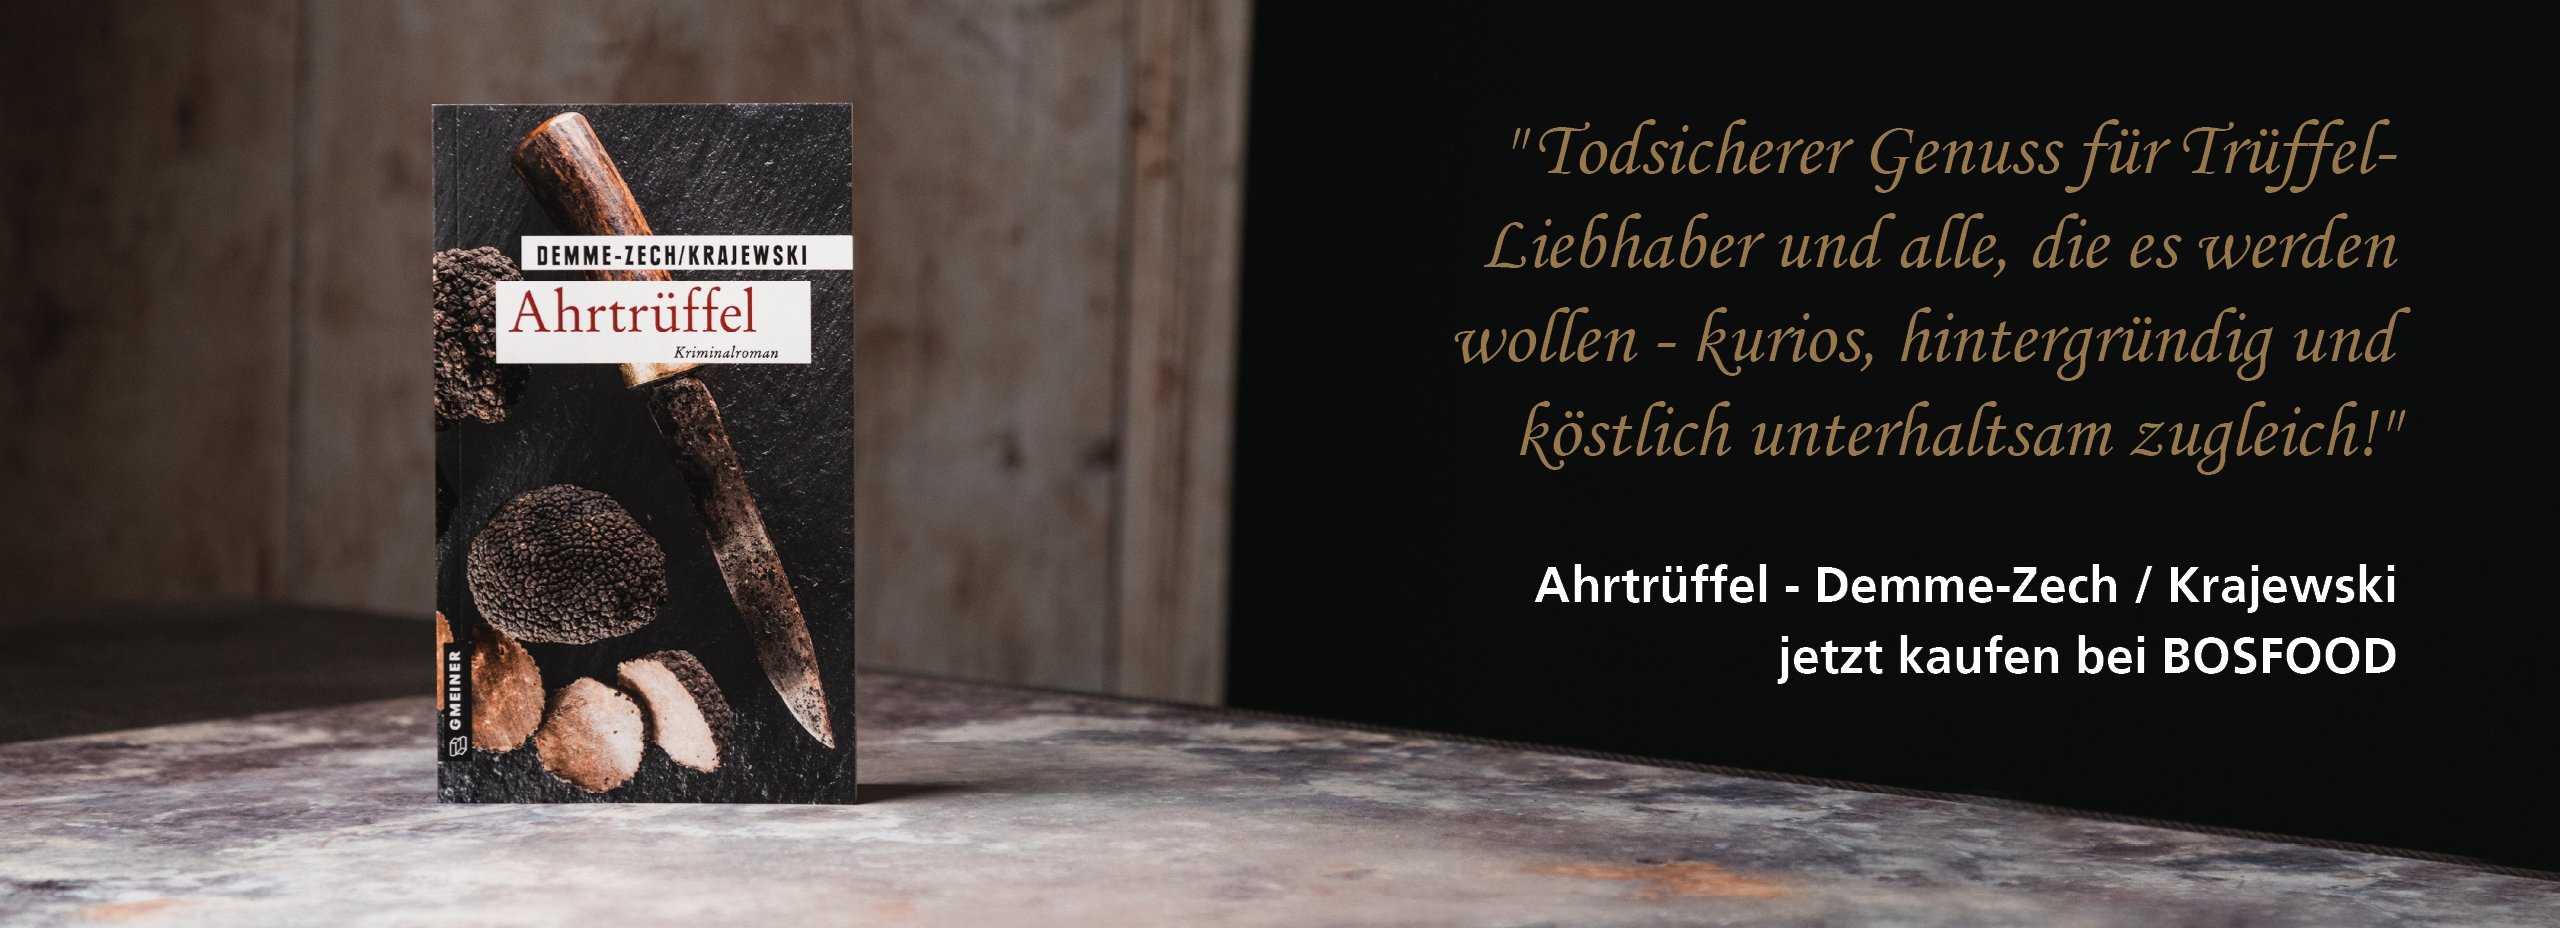 Ahrtrüffel - Demme-Zech / Krajewski